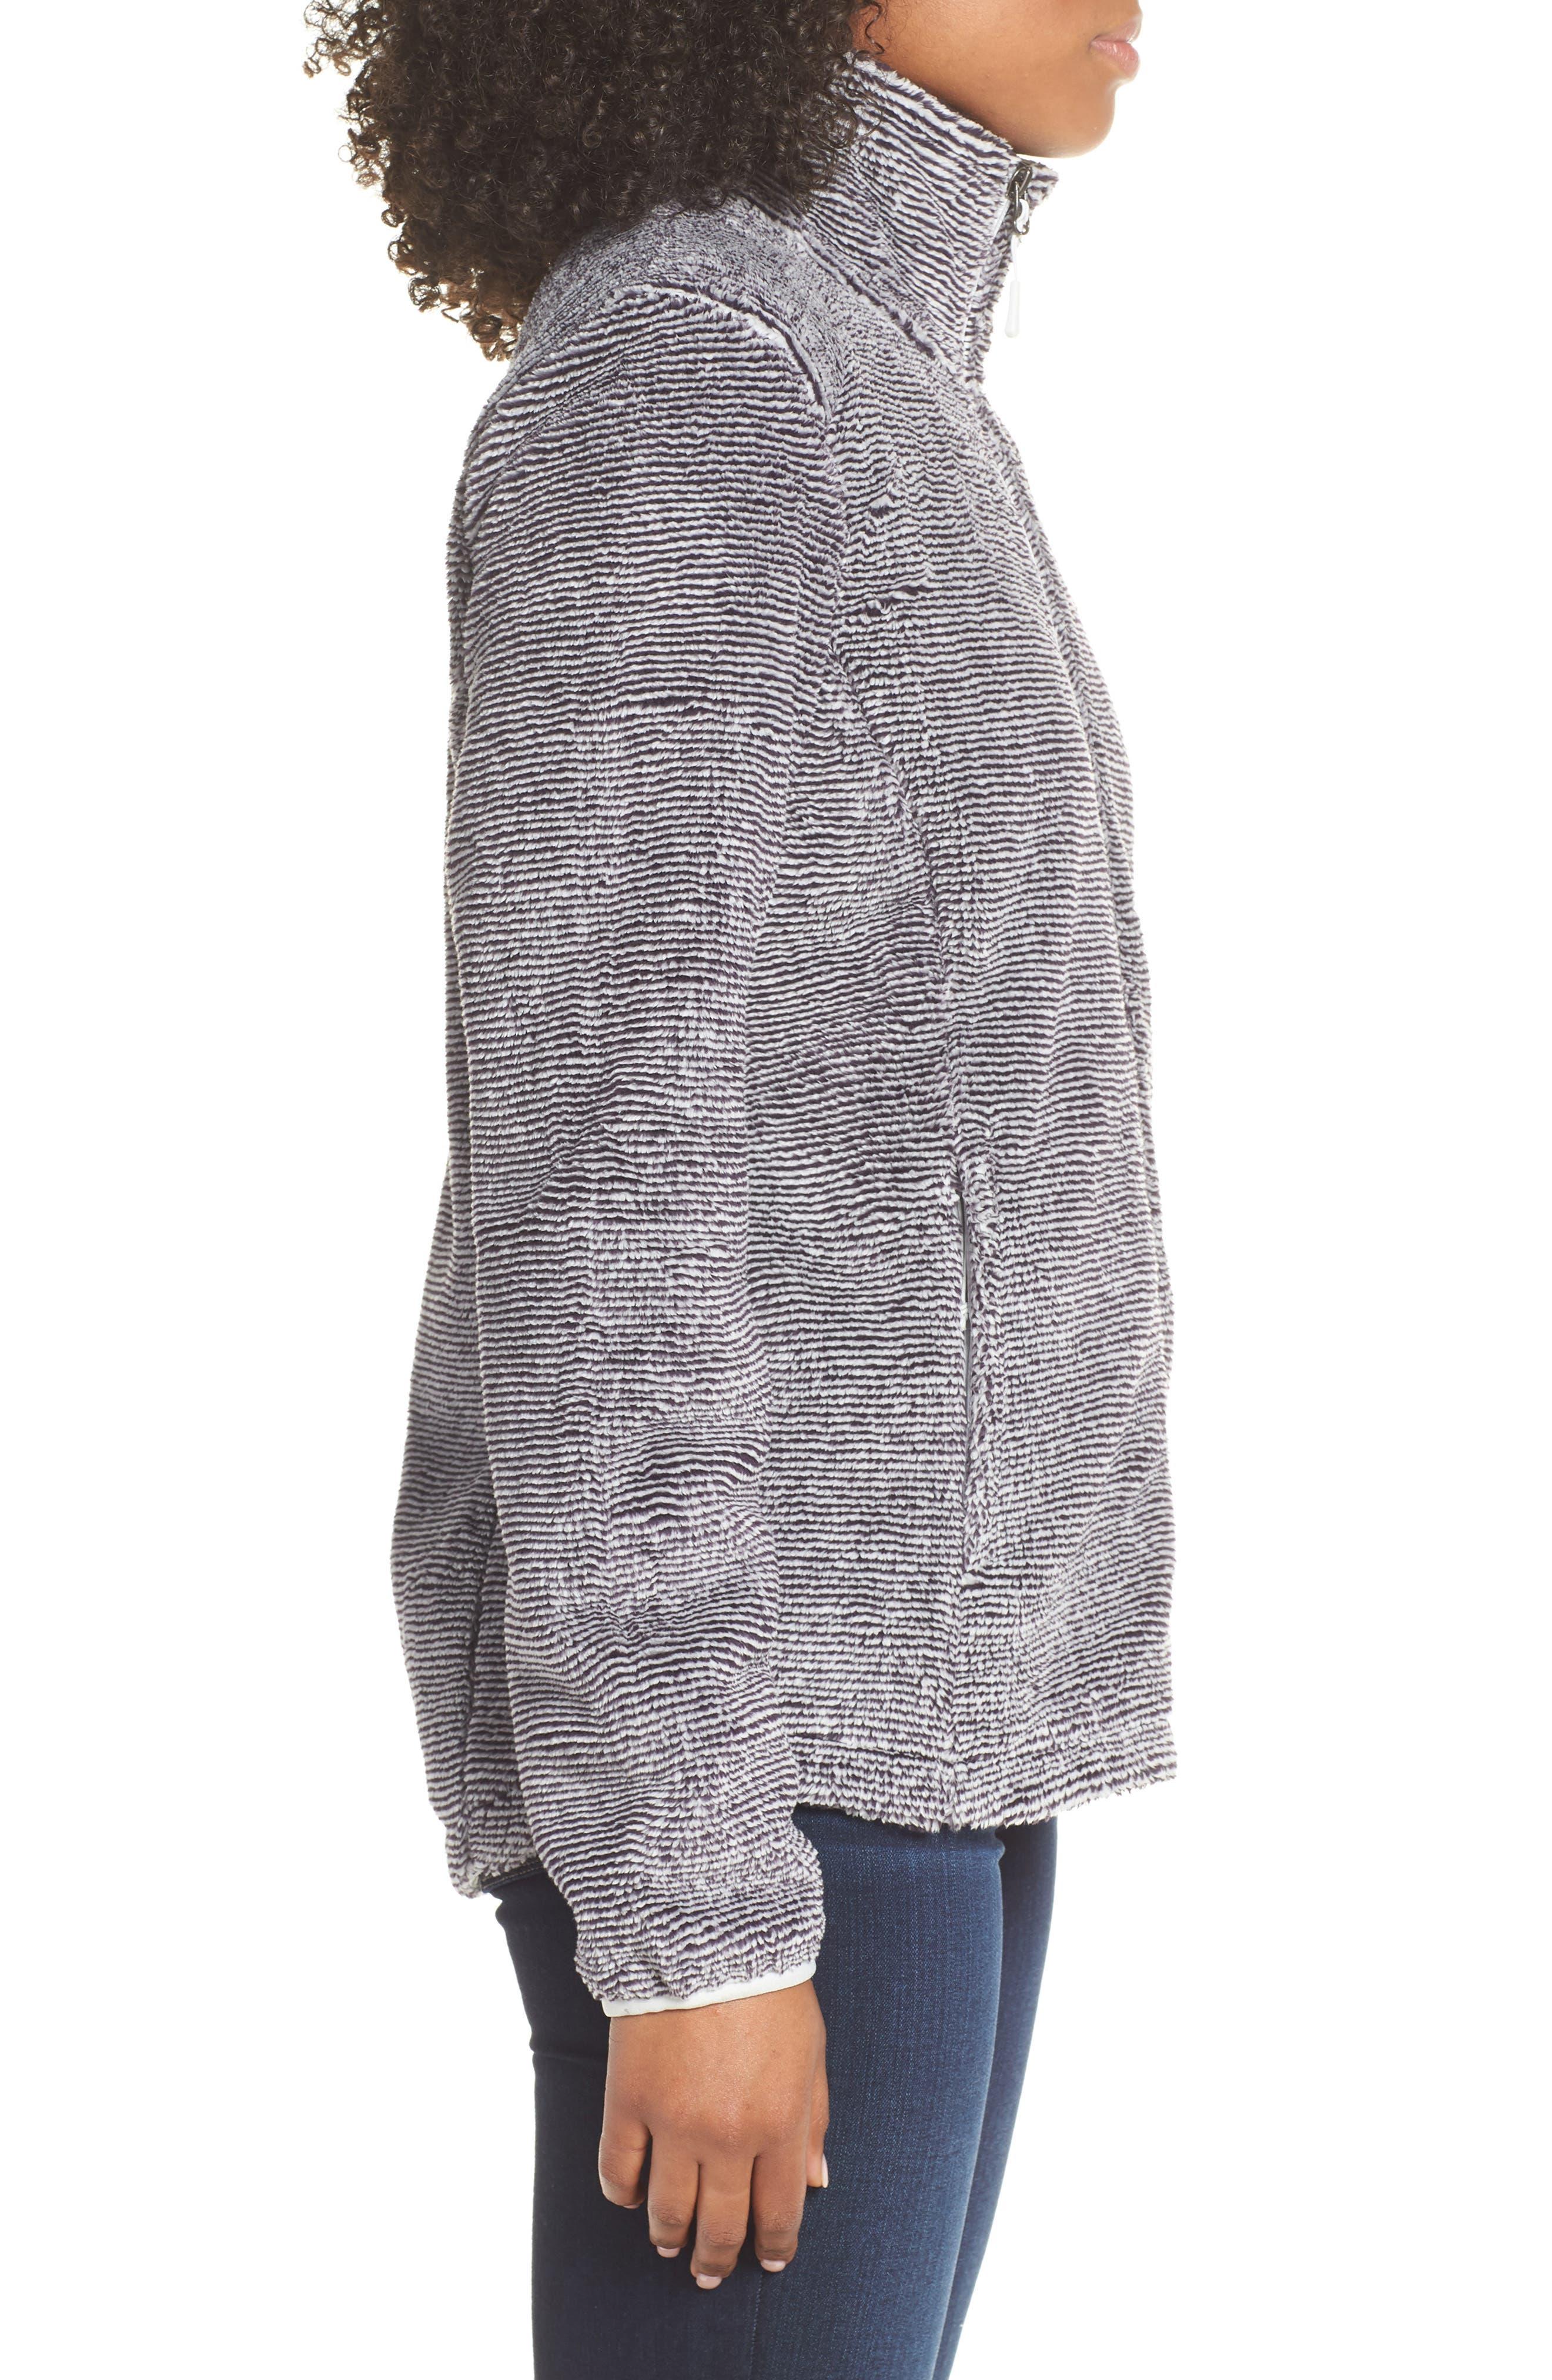 THE NORTH FACE, Osito 2 Stripe Fleece Jacket, Alternate thumbnail 4, color, BLACK/ TIN GREY STRIPE